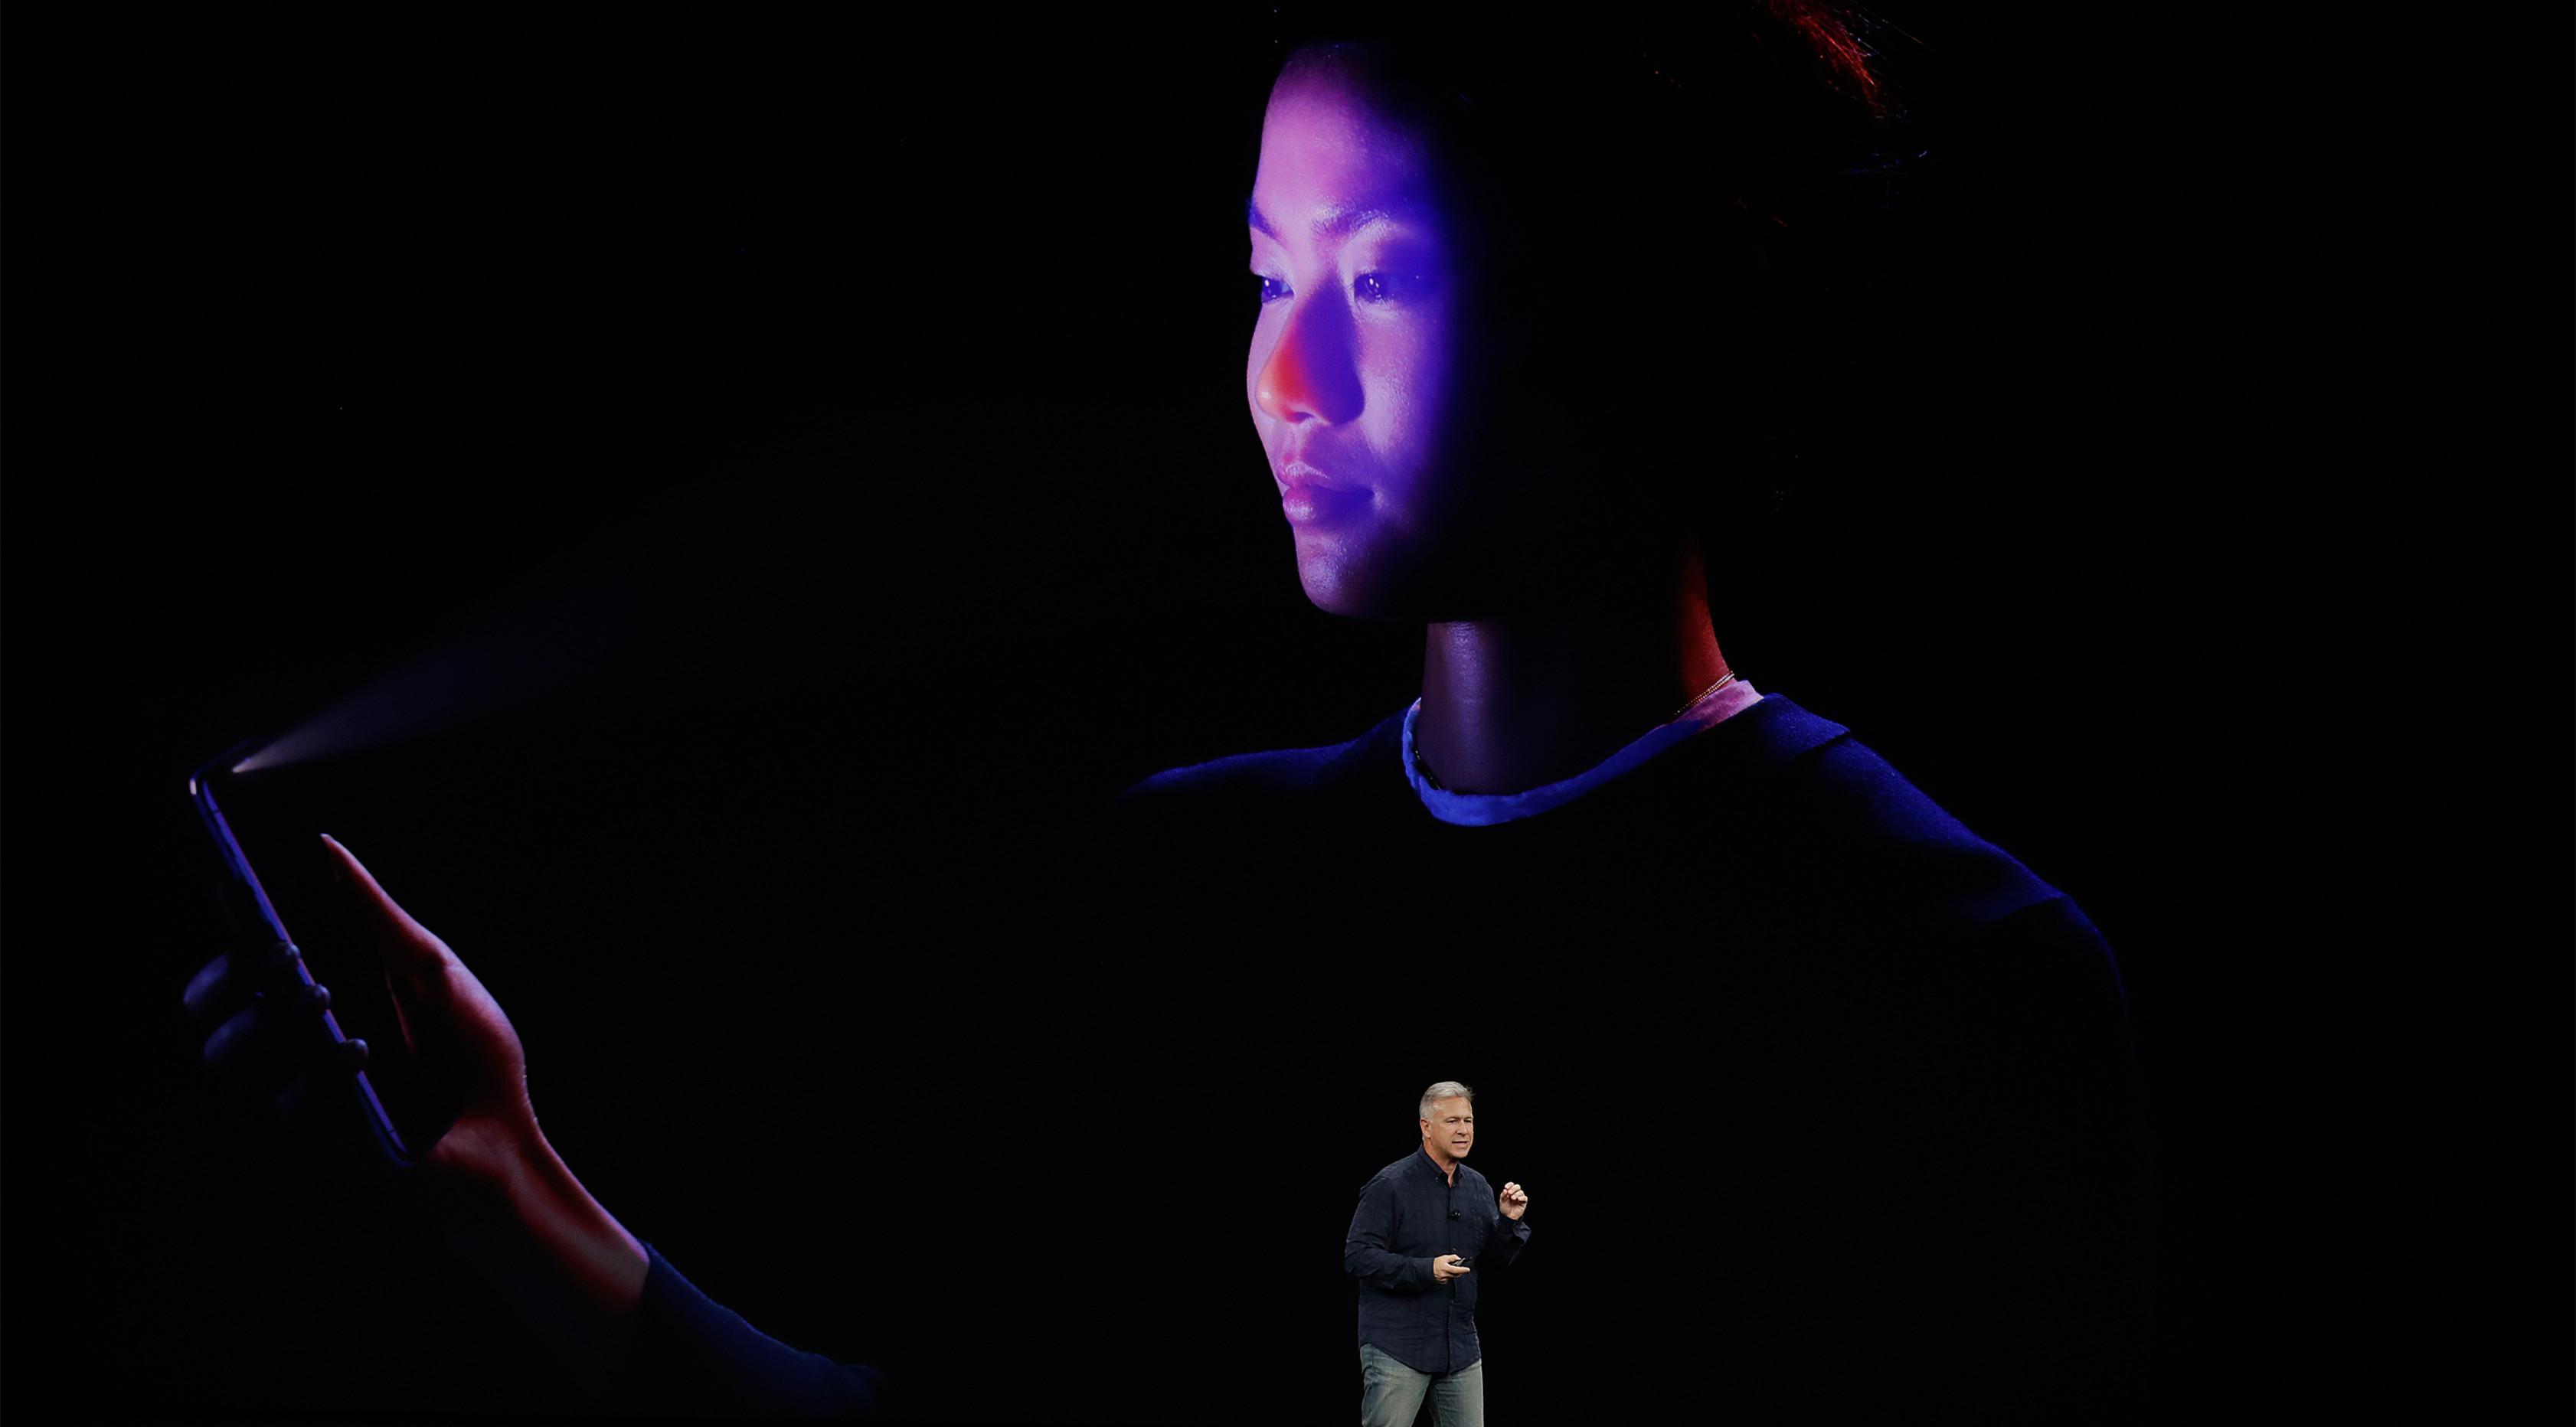 Teknologi Face ID atau pengenalan wajah iPhone X (Sumber: AP Photo/Marcio Jose Sanchez)